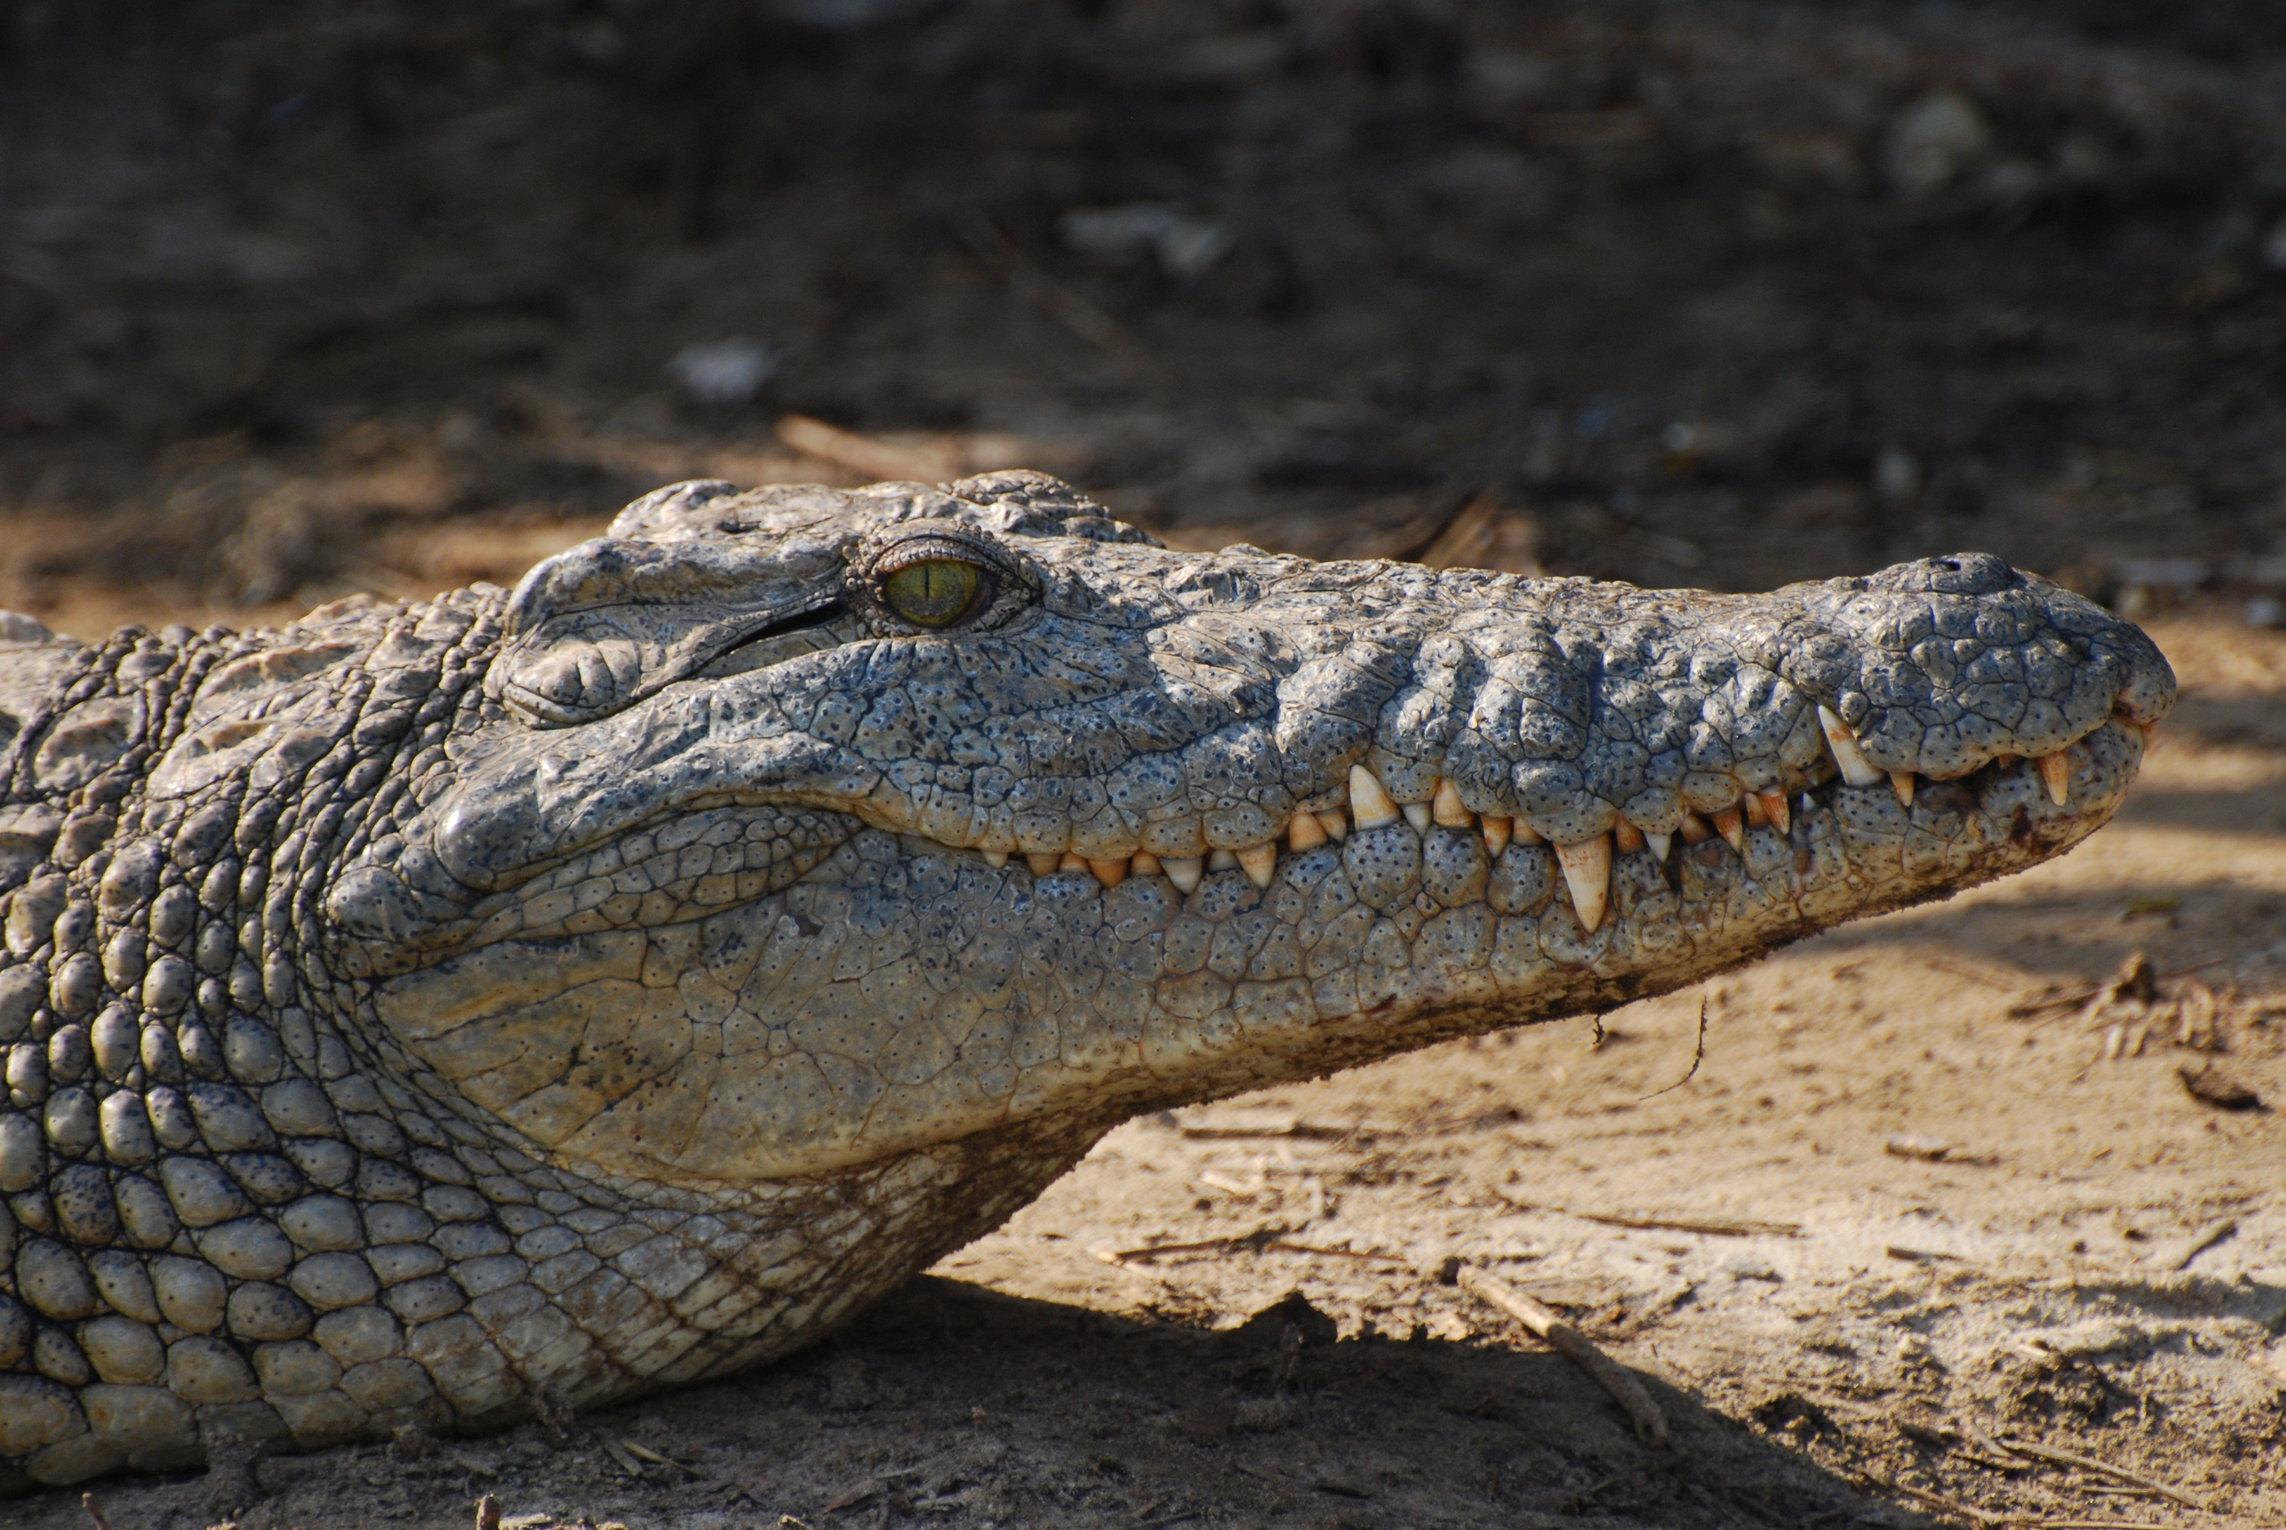 Crocodile - Close Up by krazy3 on DeviantArt